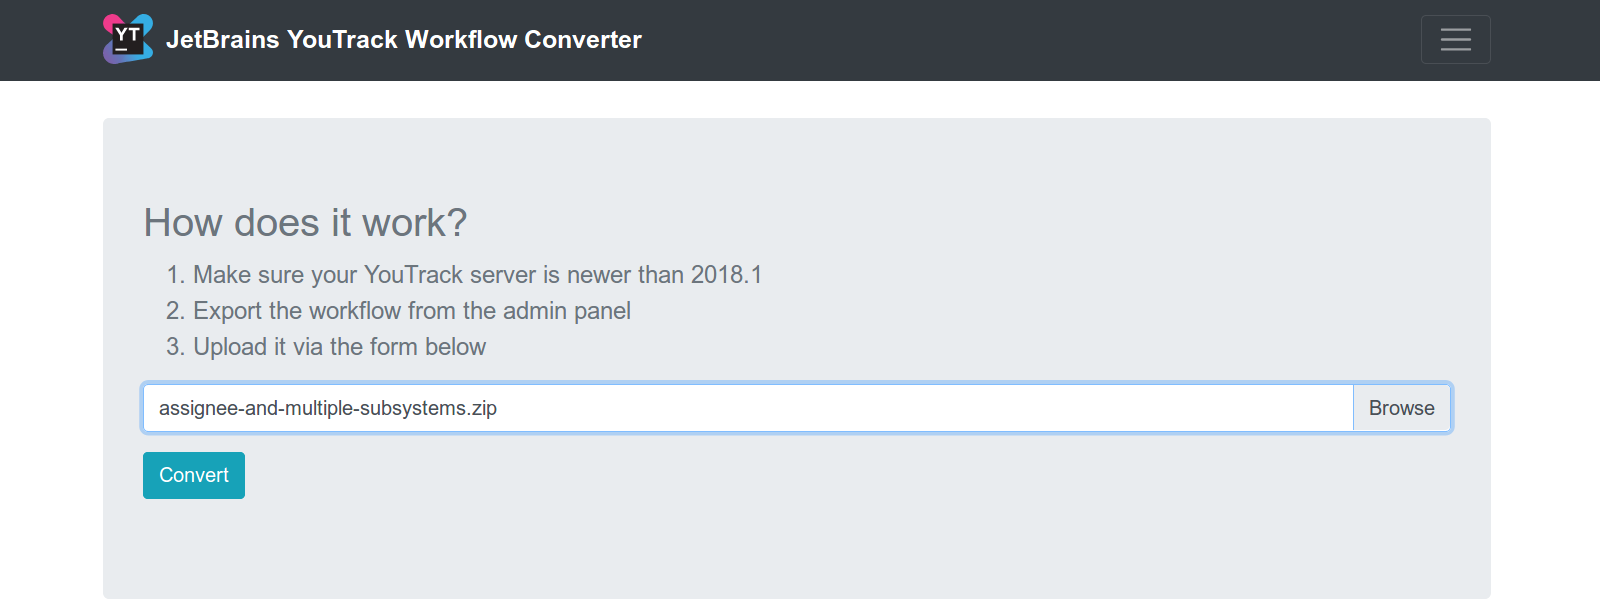 WorkflowConverter